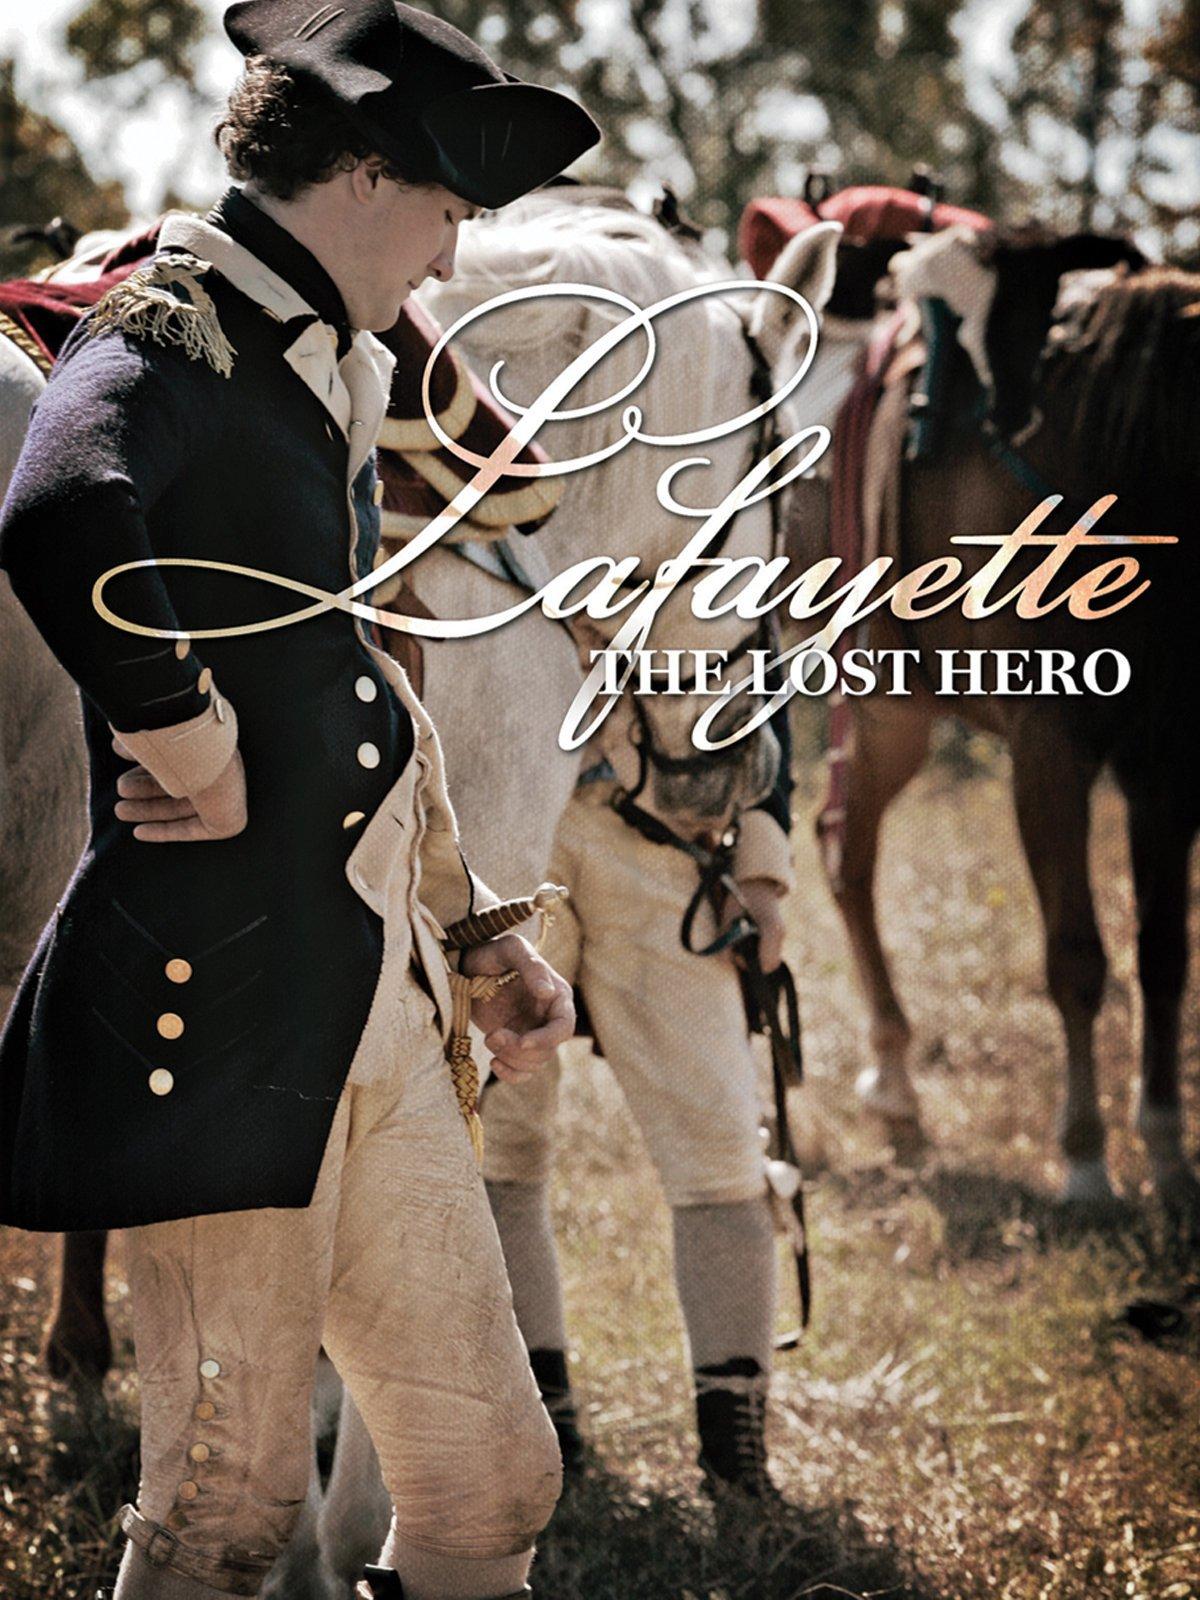 Lafayette the Lost Hero Poster.jpg